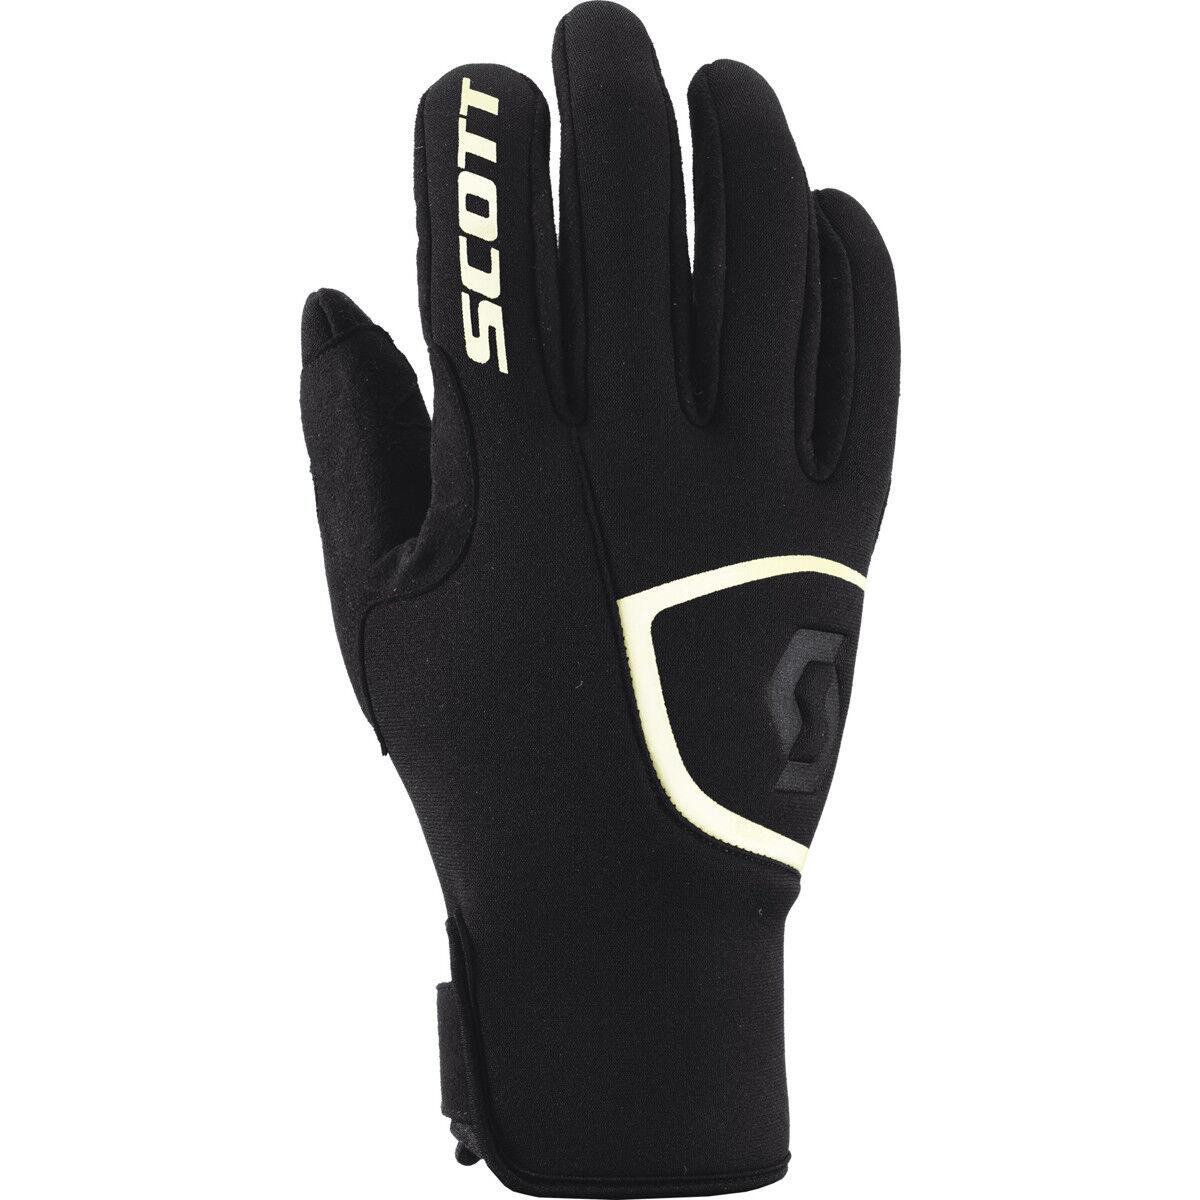 Scott Neoprene II MX Motocross / DH Fahrrad Handschuhe schwarz/weiß 2017